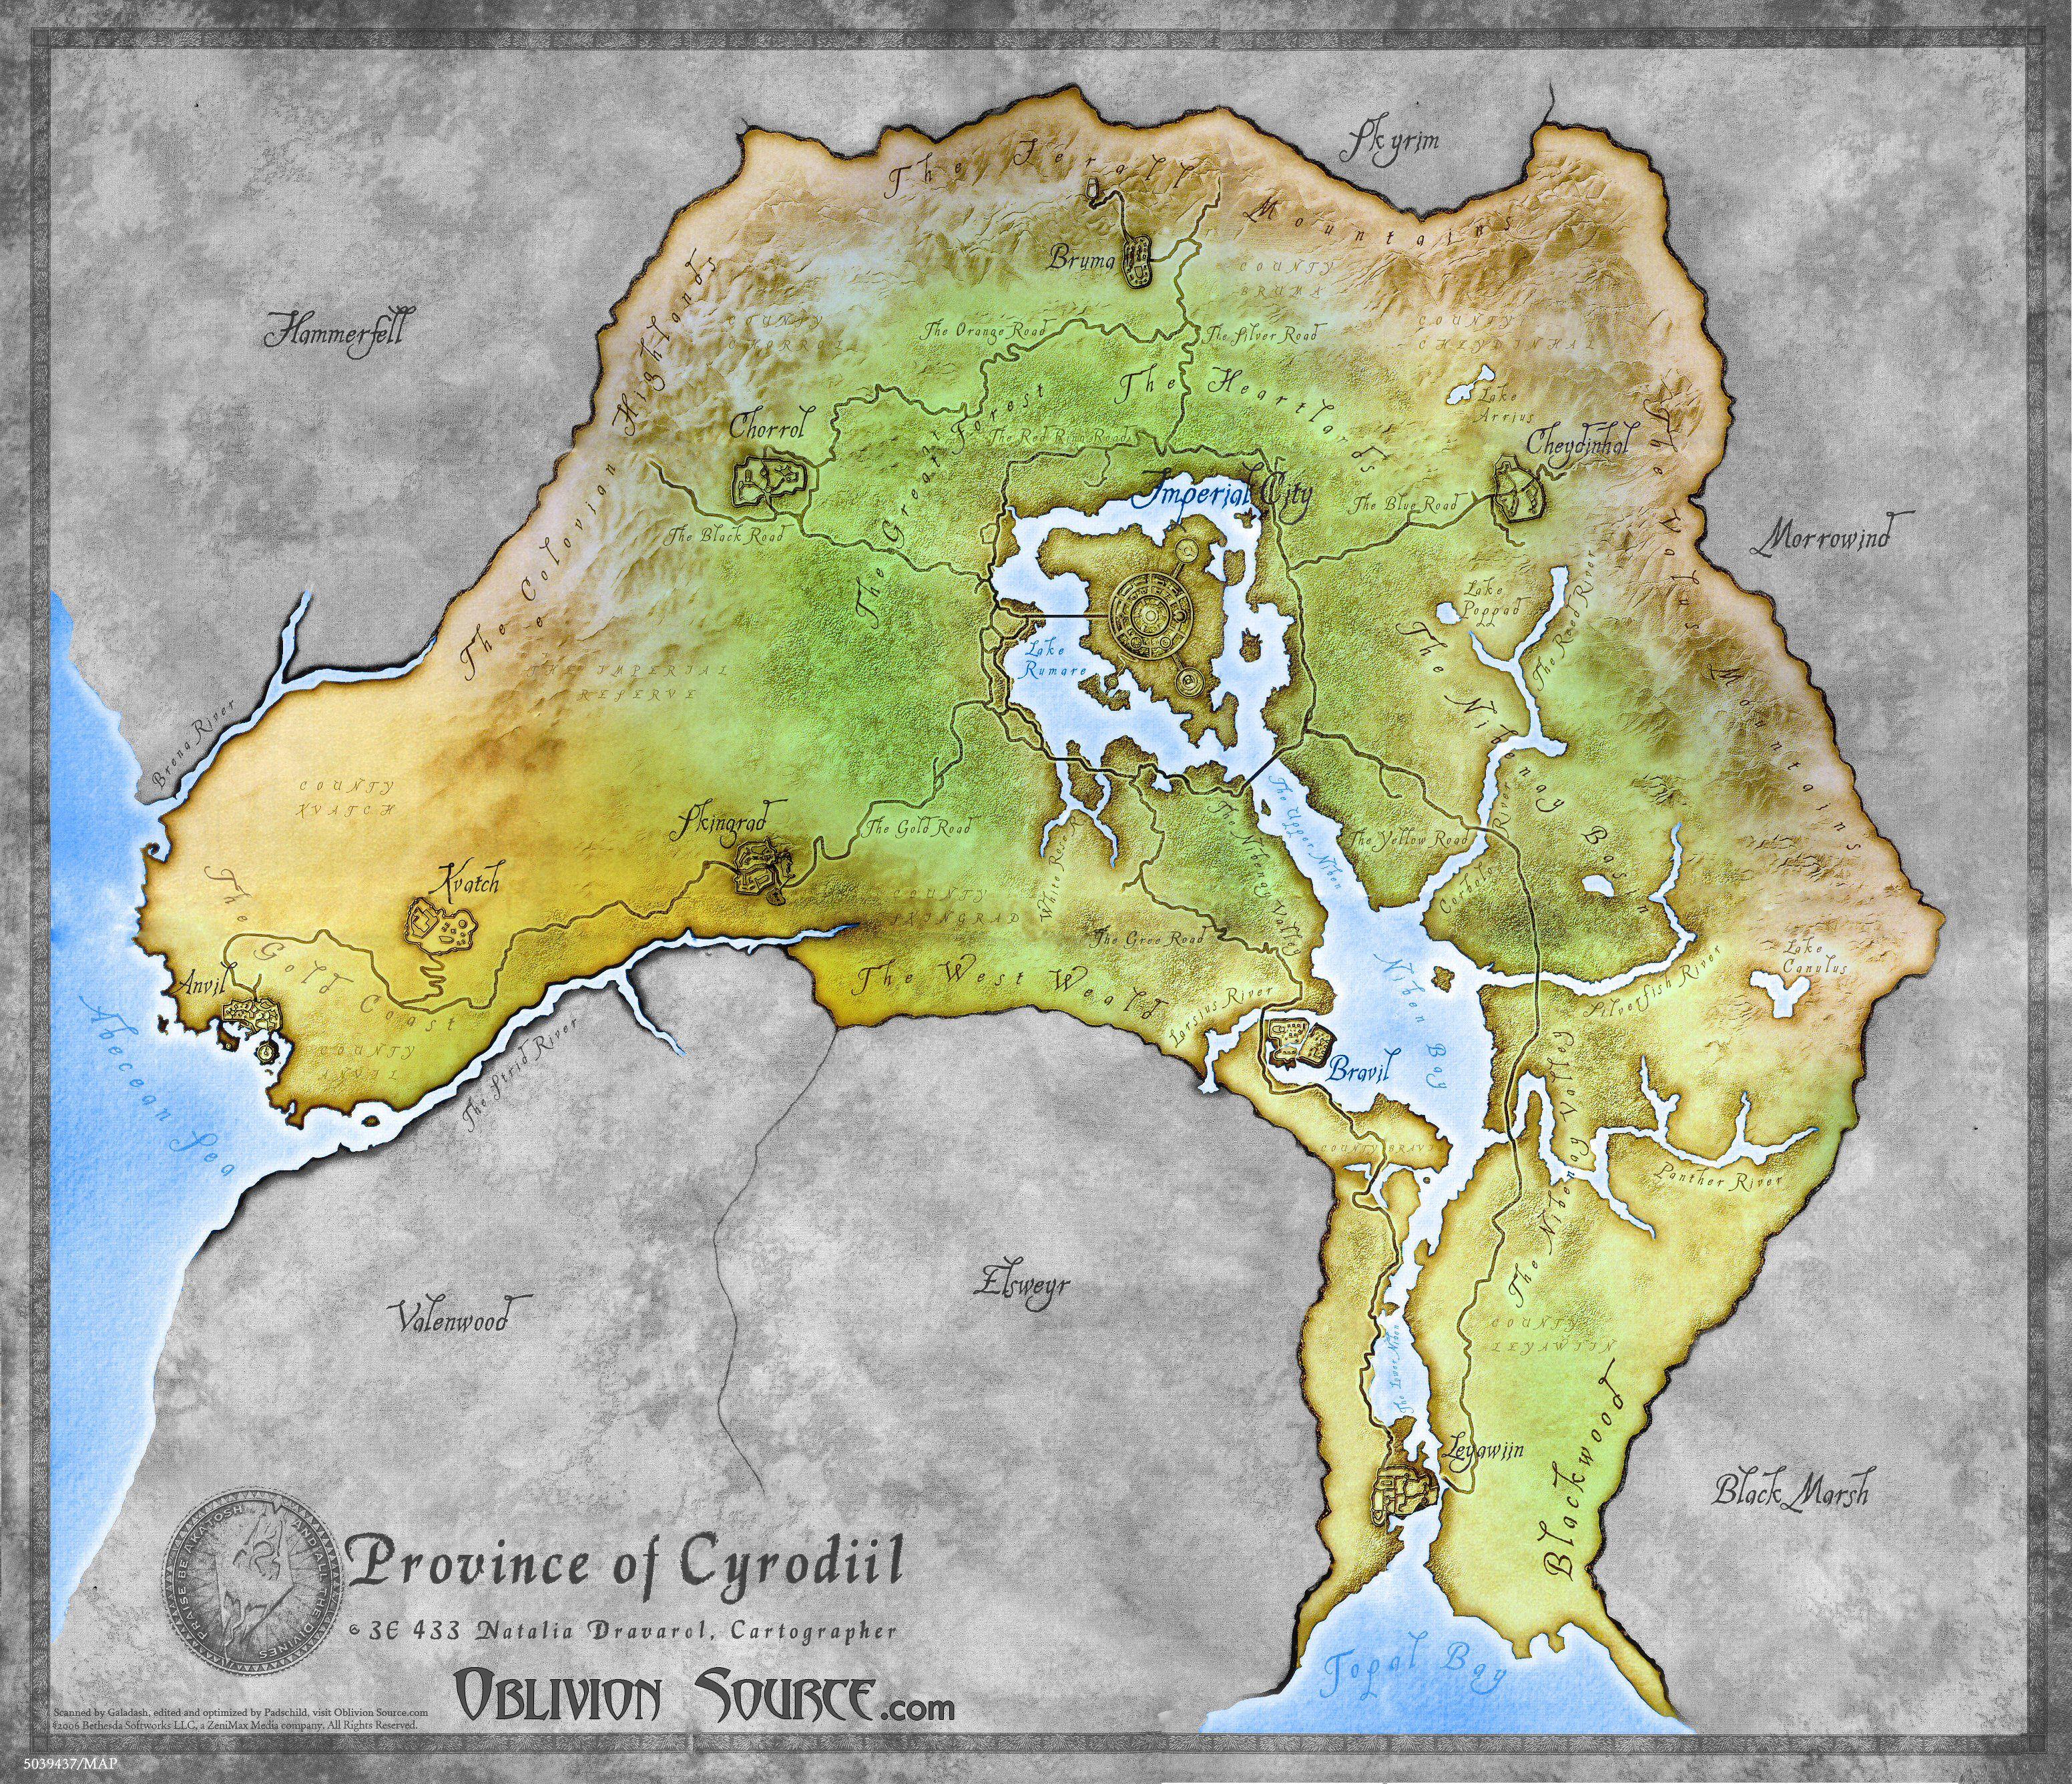 Oblivion   Province of Cyrodiil map. I love Skyrim, but I think